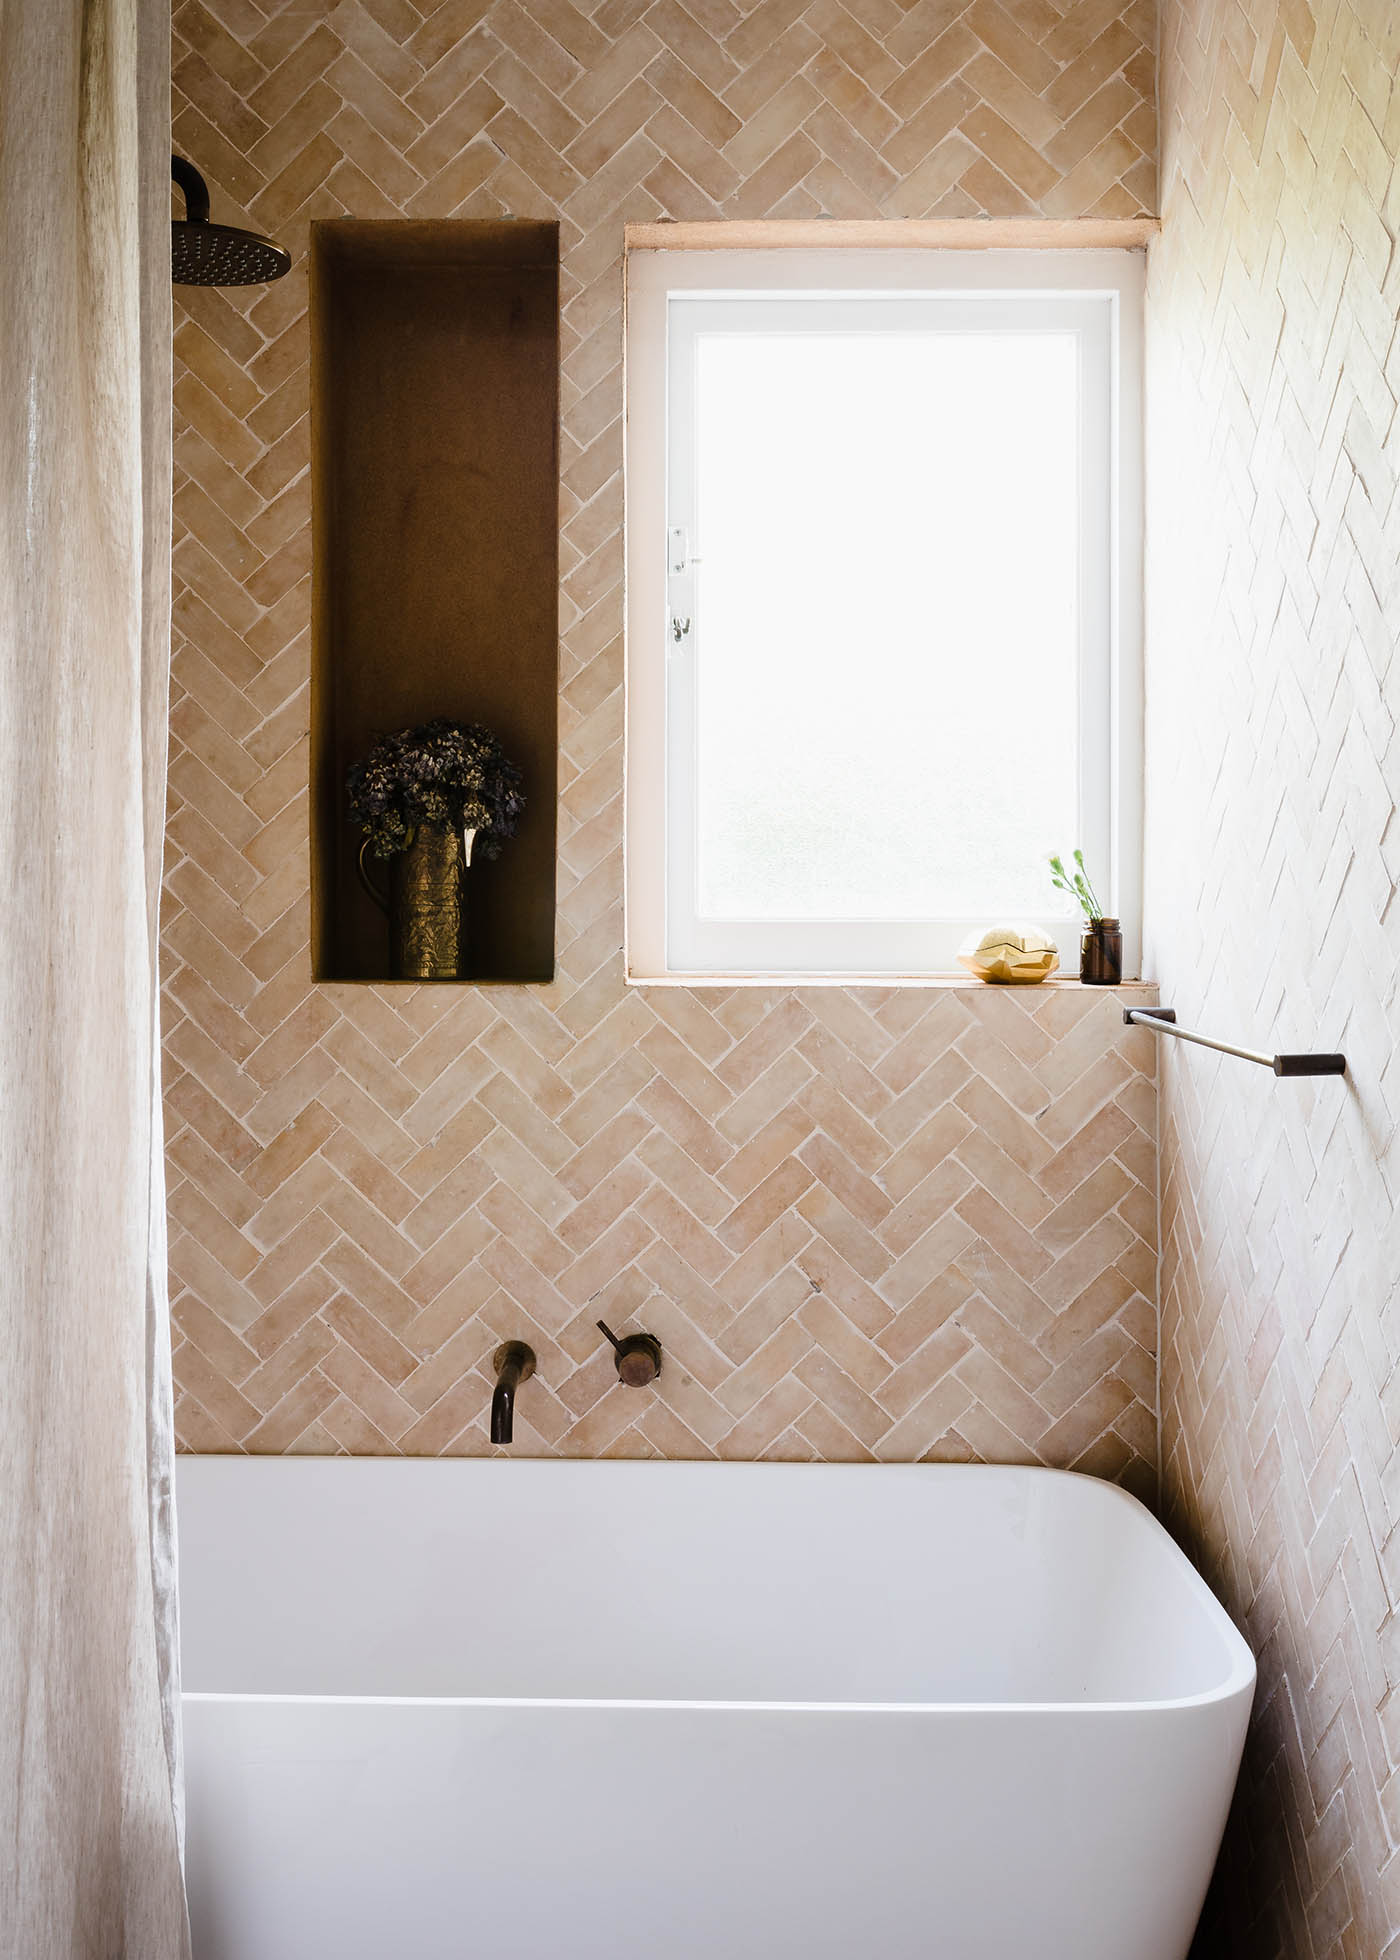 FL005 GABBE INTERIOR TILESOFEZRA Georgia Ezra Home Feature shower Mosaic Moroccan Bejmat Natural shower tile.jpg